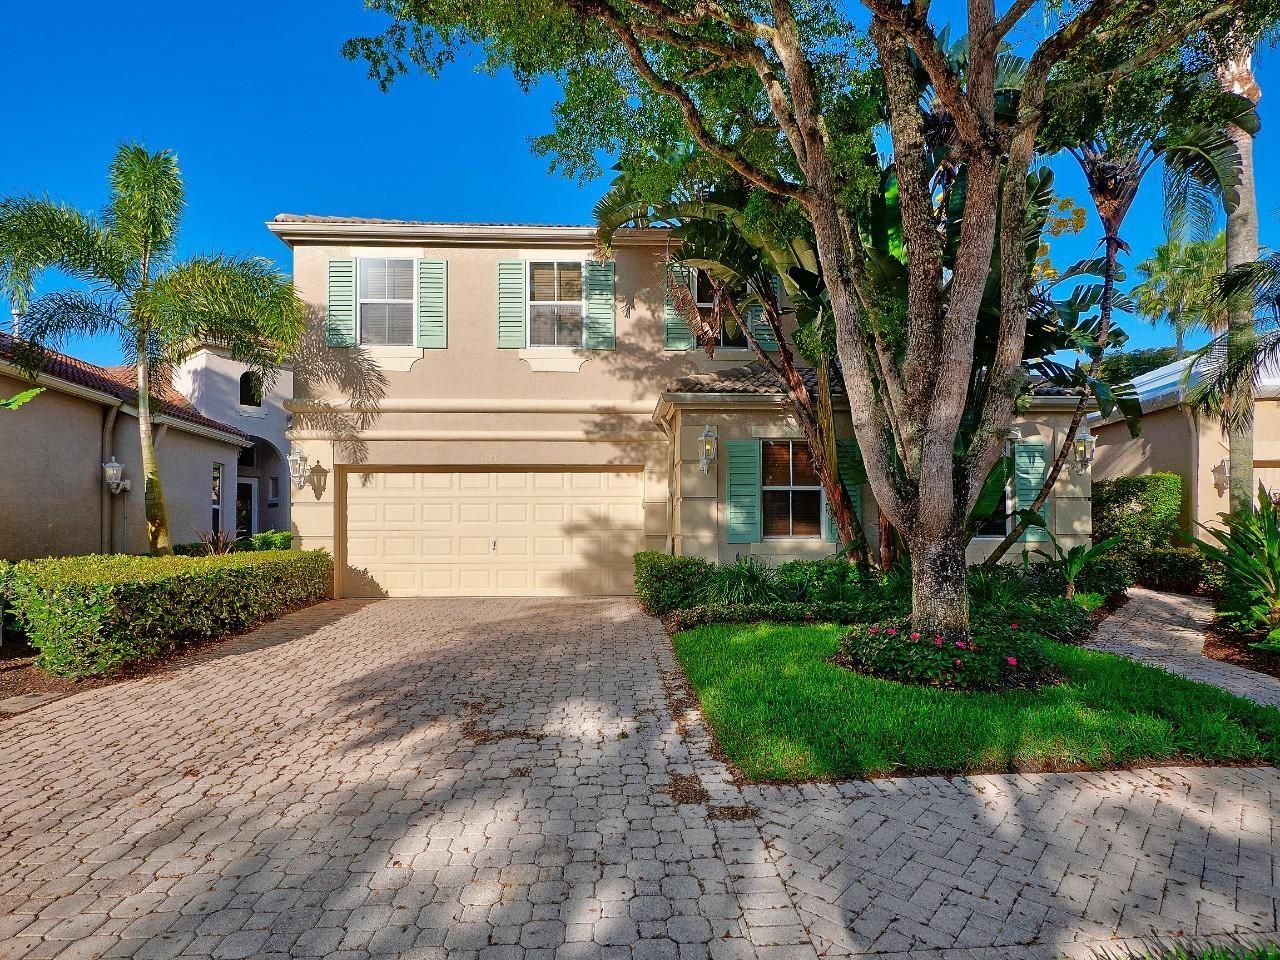 324 Sunset Bay Lane, Palm Beach Gardens, FL 33418 - #: RX-10700694